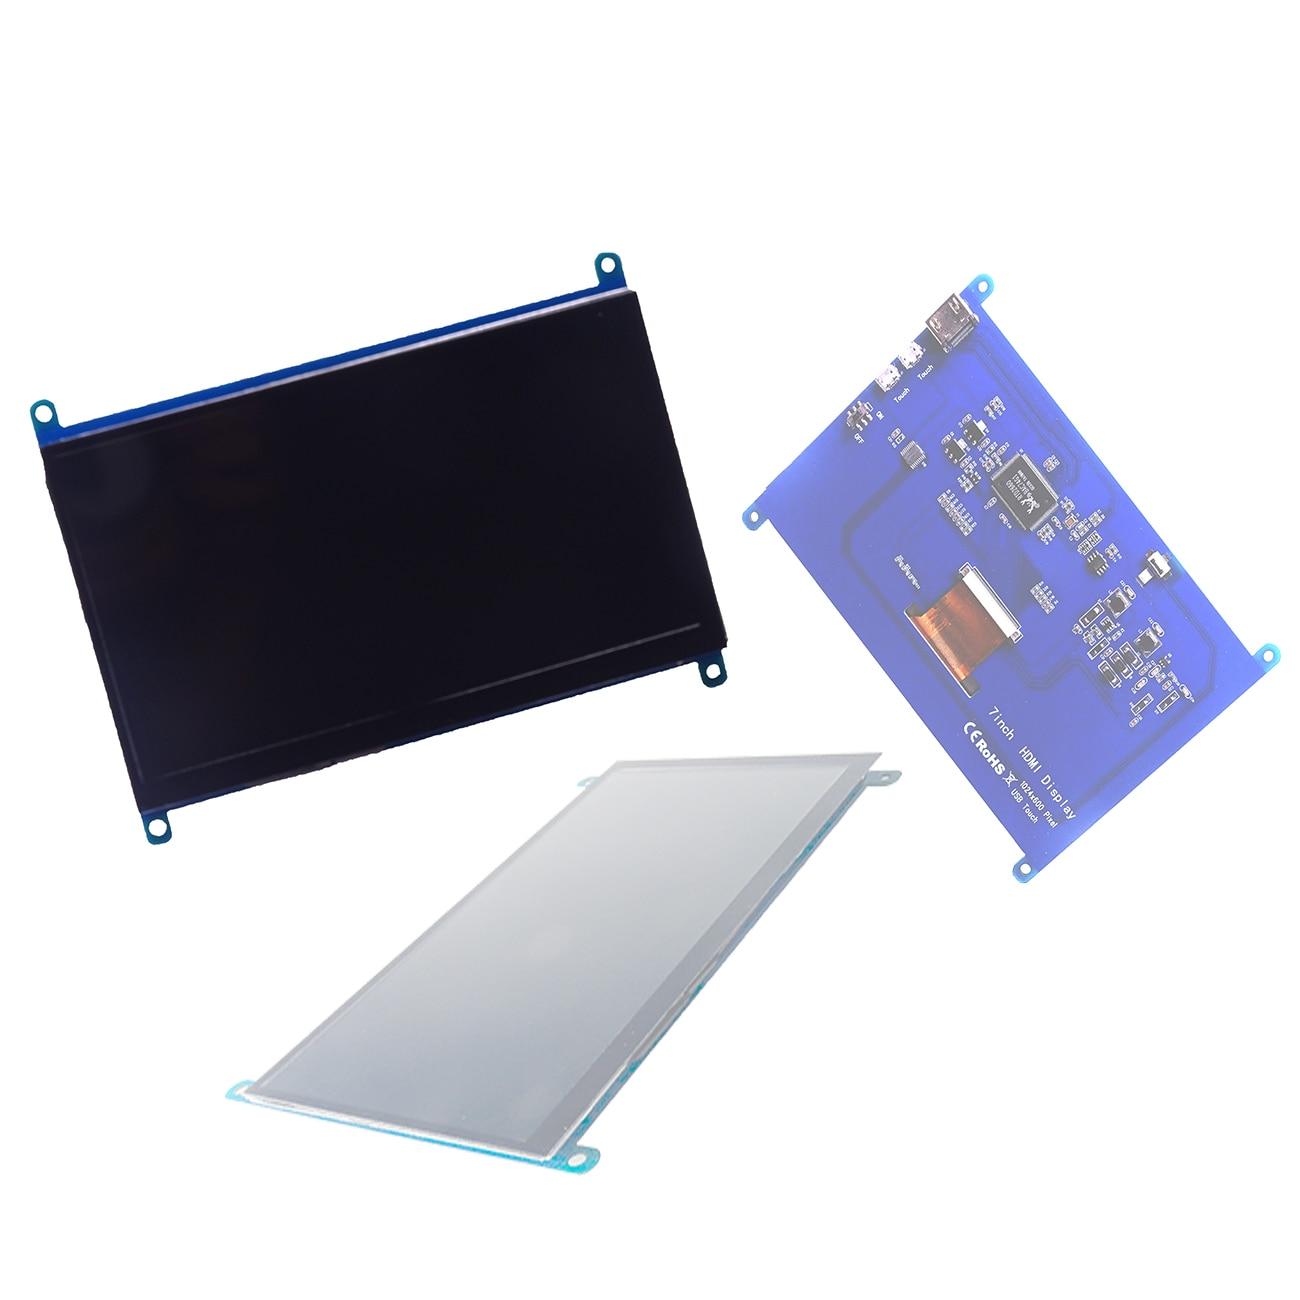 Für Raspberry Pi 7 Zoll 1024*600 Touch Screen 7 Zoll Kapazitiven LCD HDMI Interface Unterstützung Verschiedene Systeme